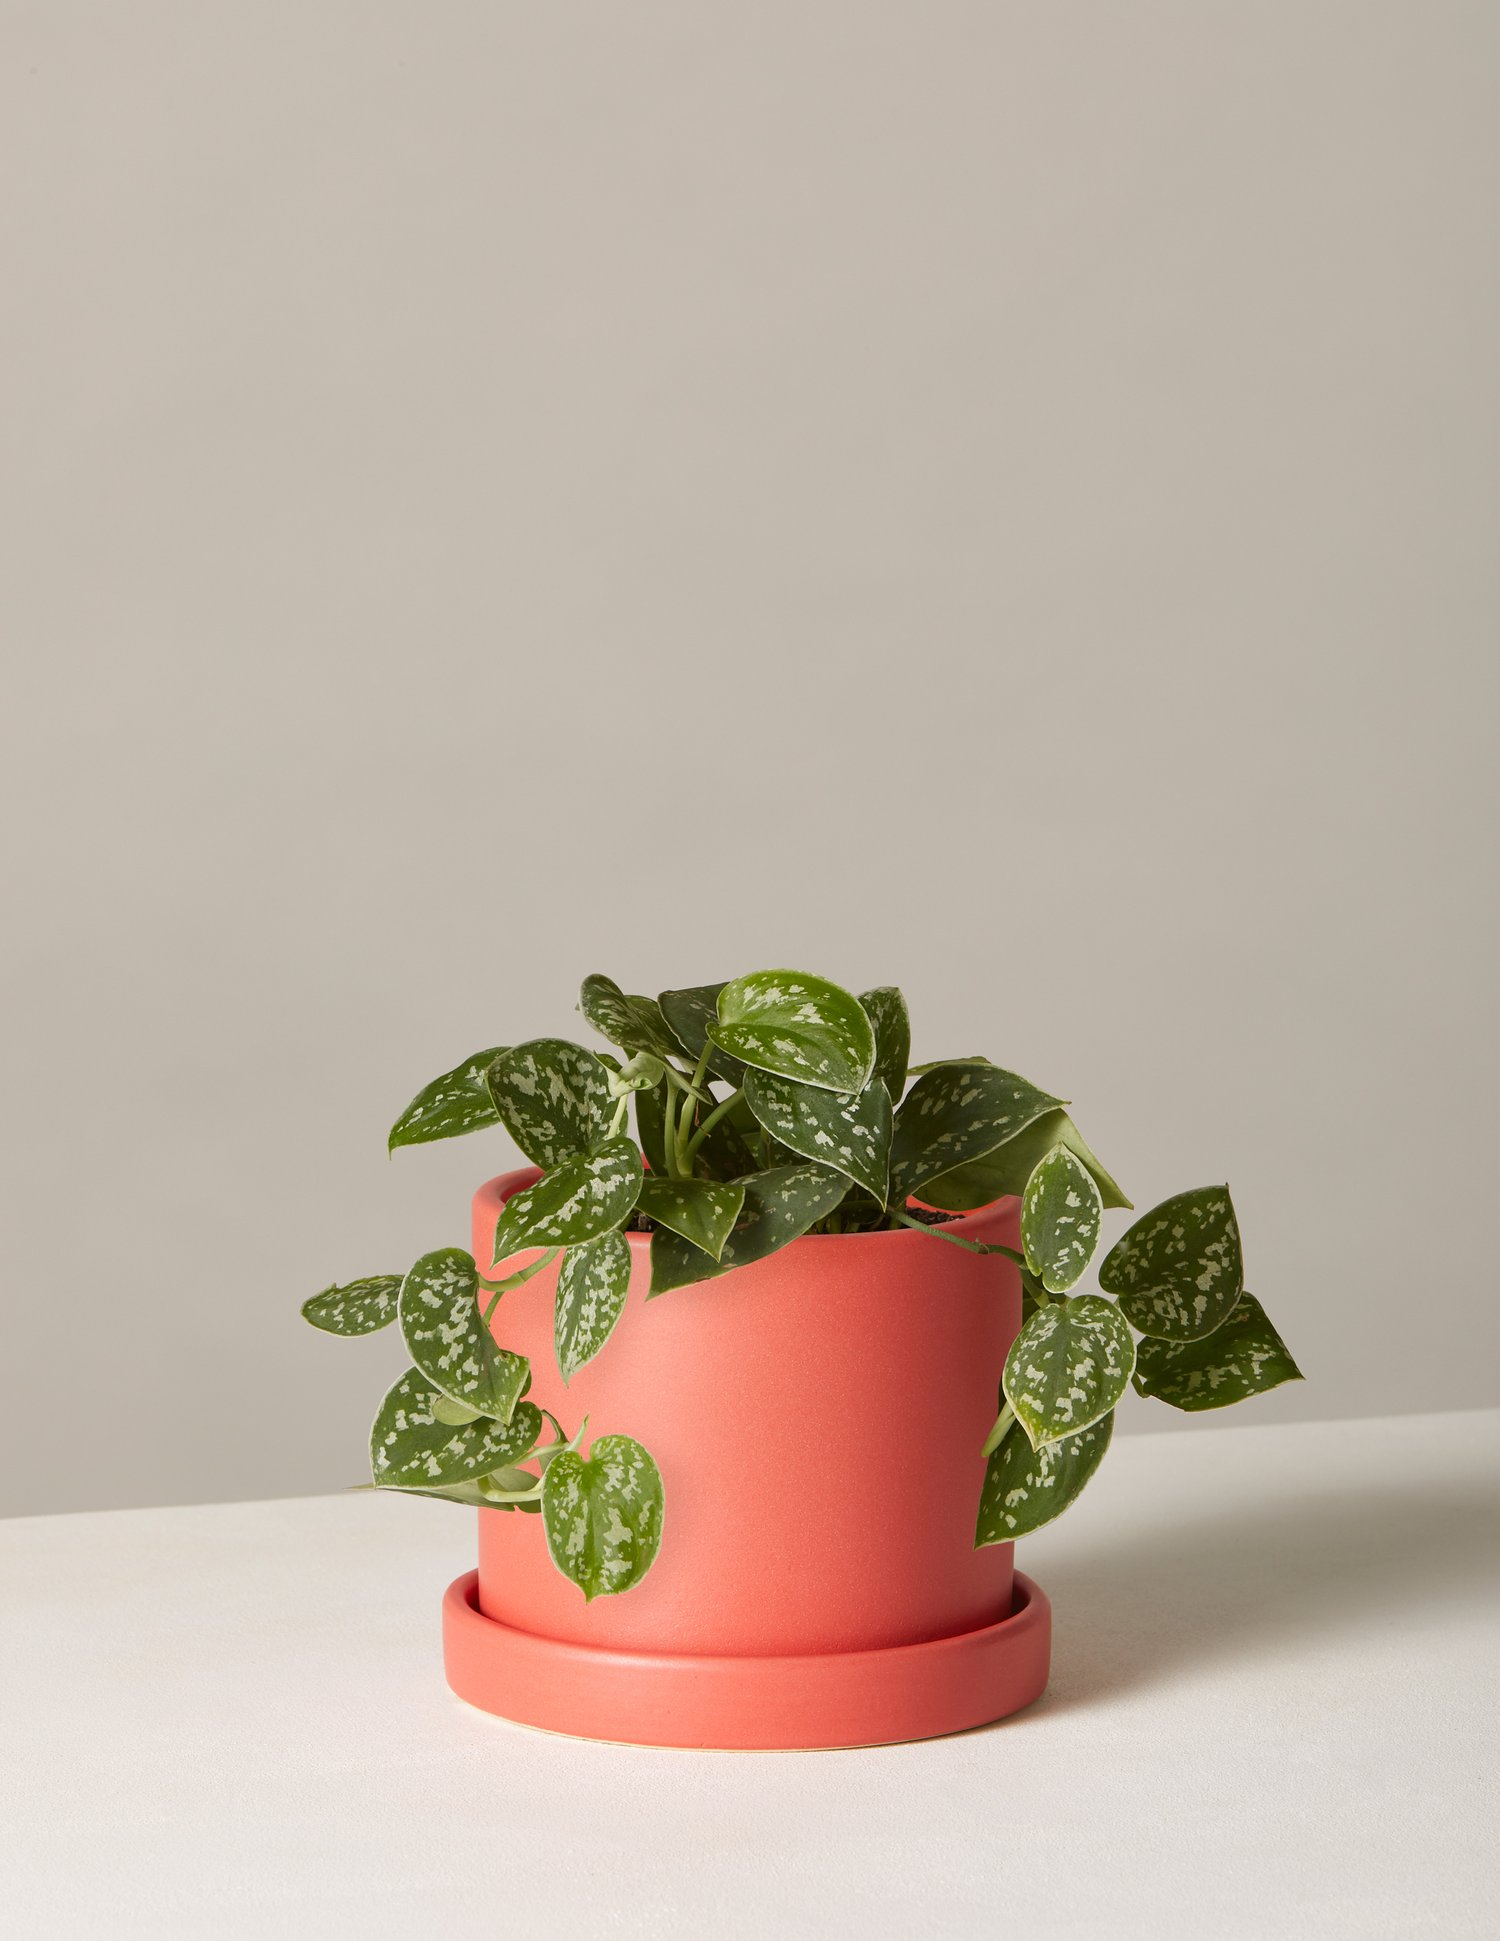 valentinesgiftyourselfplant2.jpg